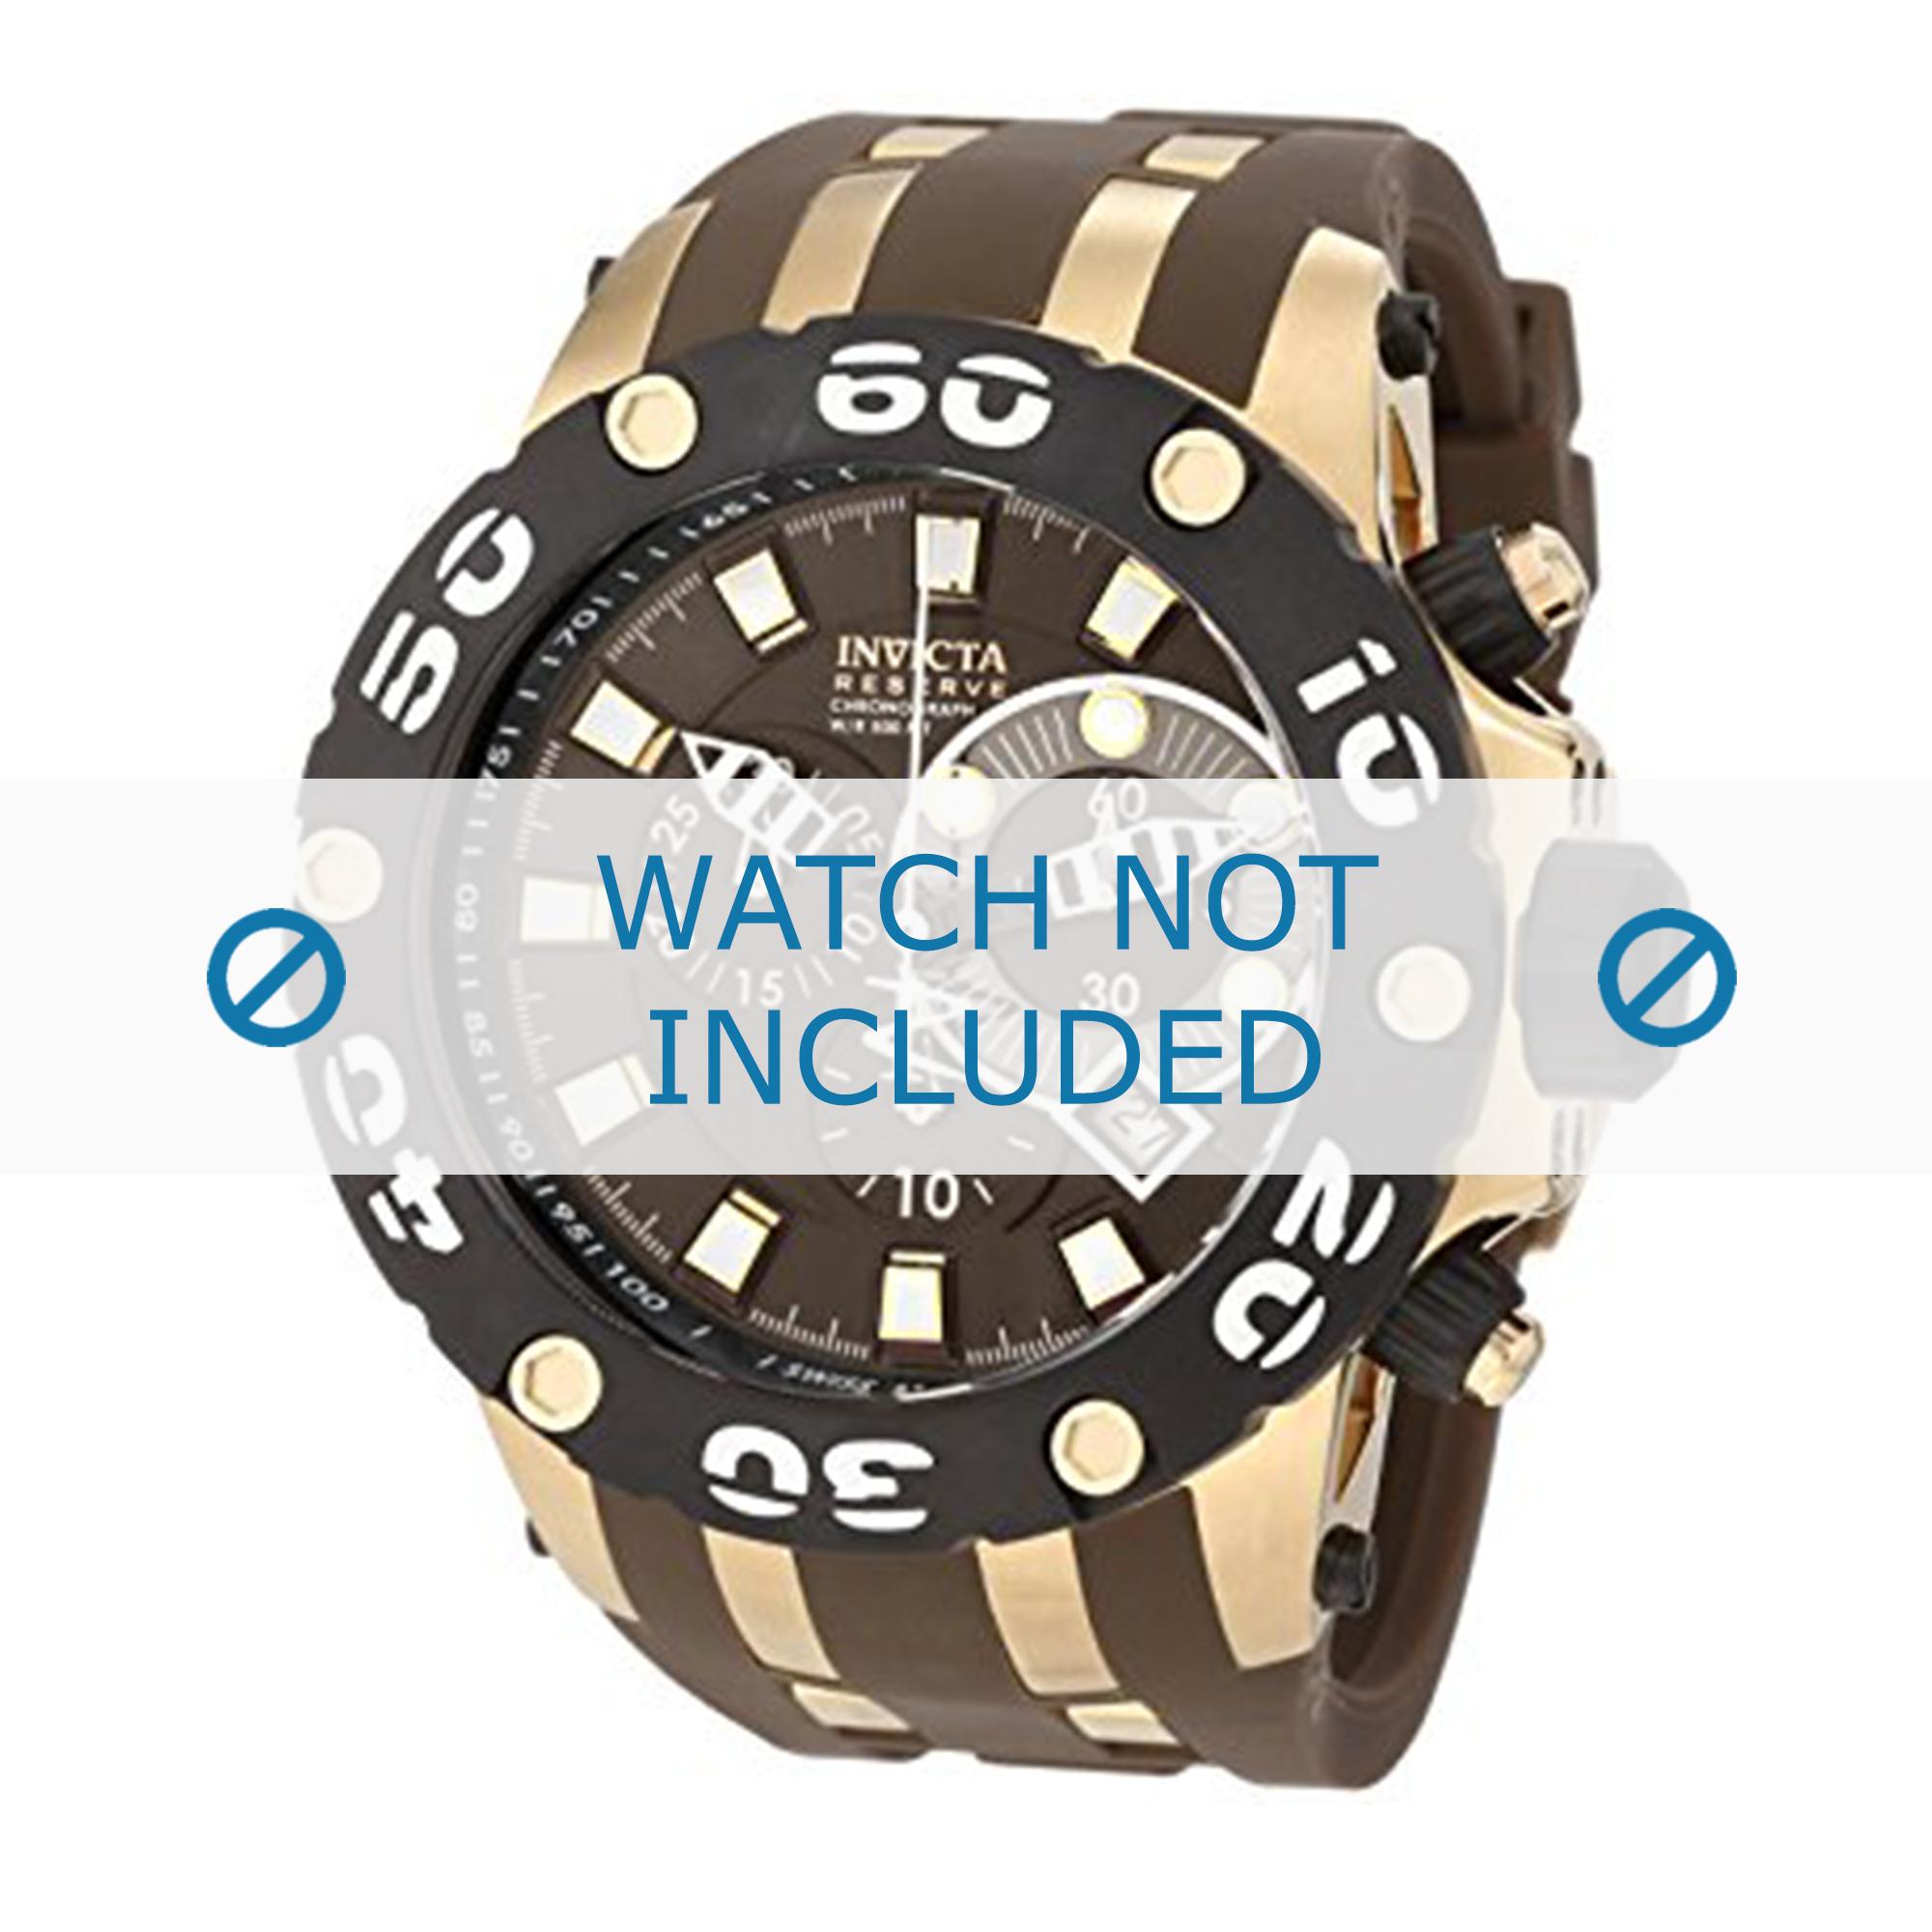 Invicta horlogeband 0916 Subaqua Rubber Bruin 32mm